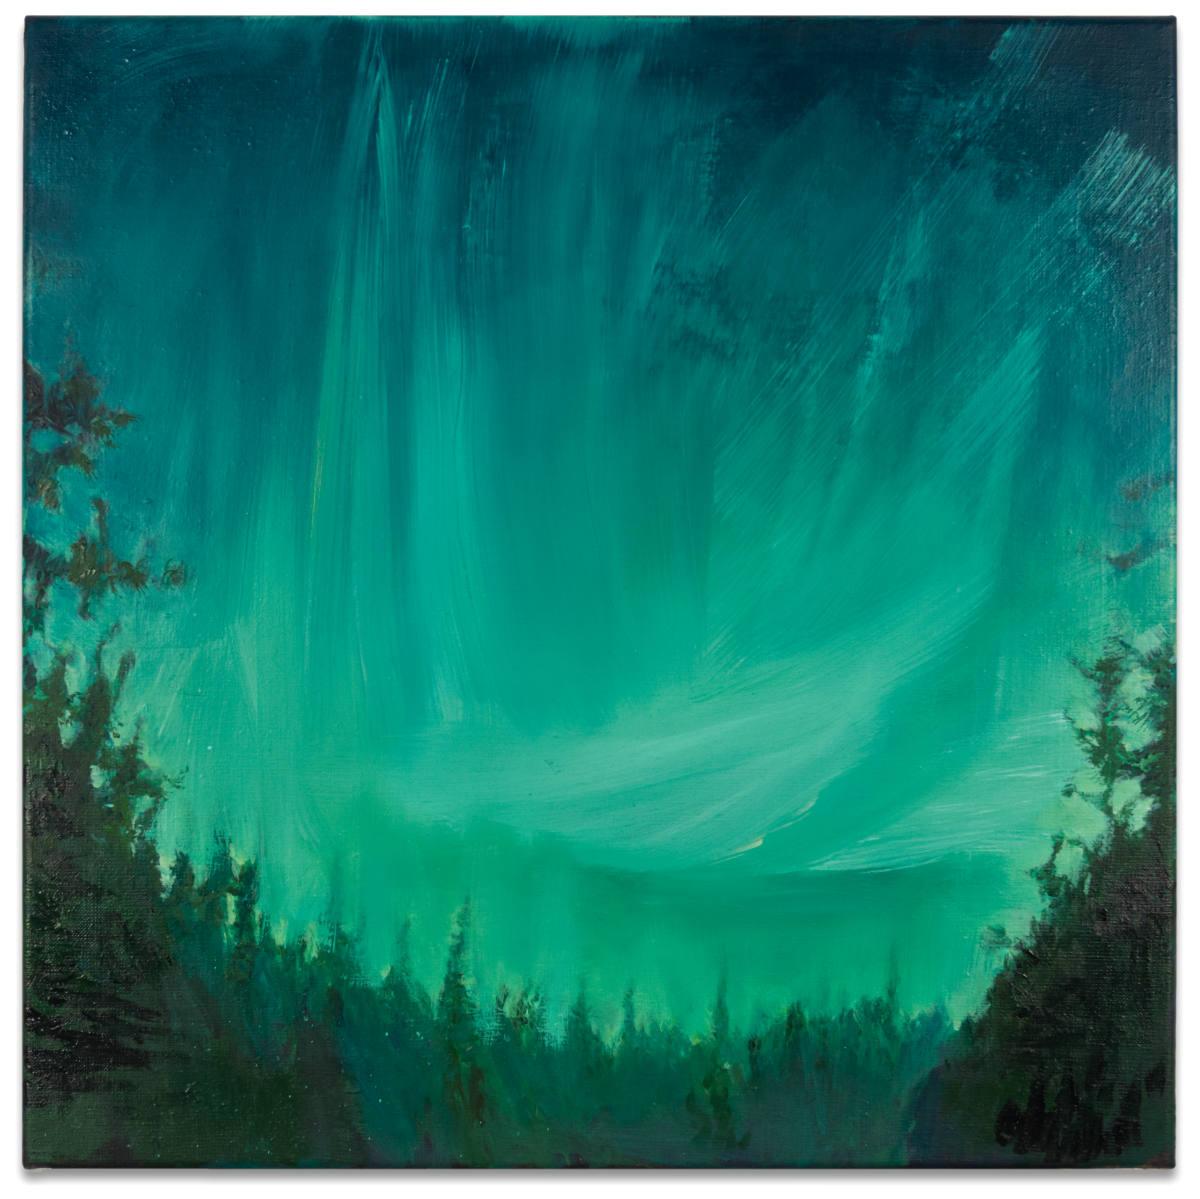 Enlightened — After the sky fell, 2020, oil on linen, 65 x 65cm